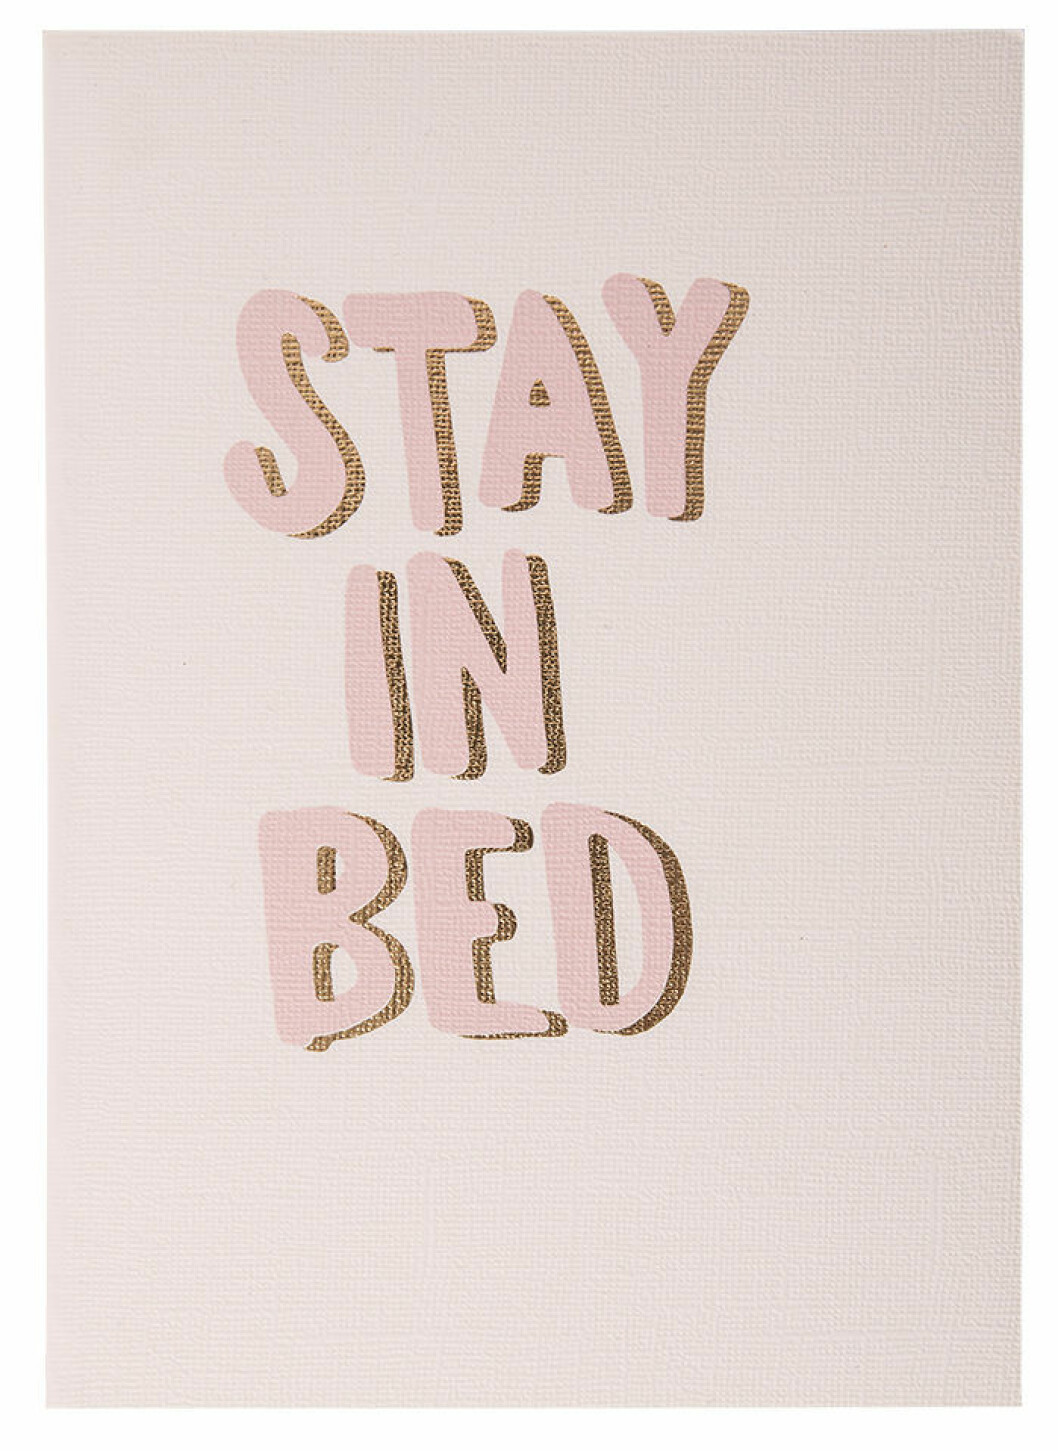 Stay in bed-anteckningsbok från Therese Lindgren + Lagerhaus